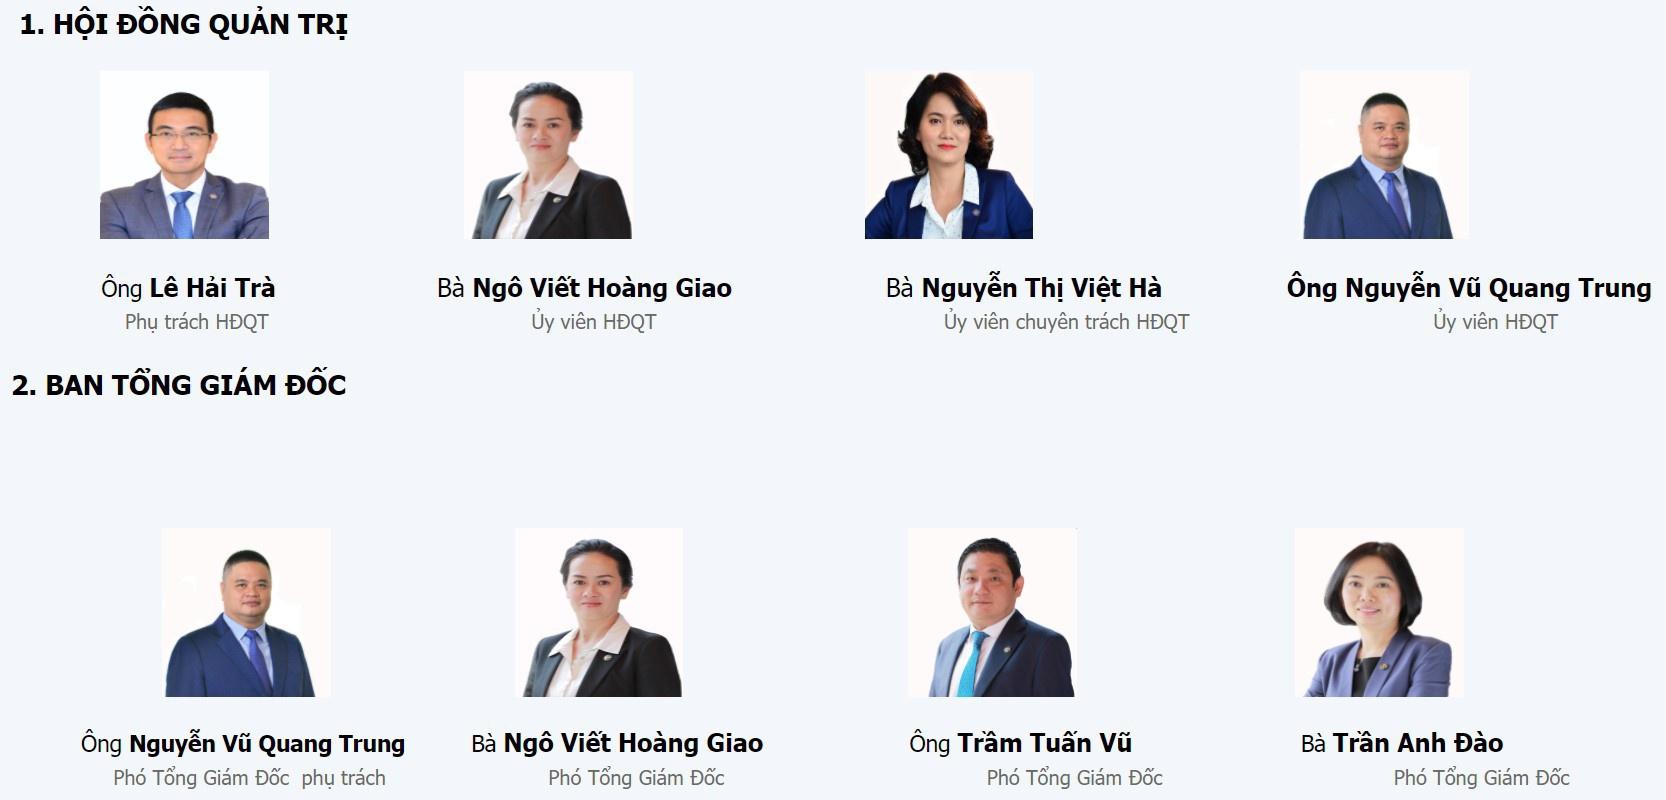 Ong Le Hai Tra nhan tong luong, thuong 840 trieu trong nam 2020 anh 1